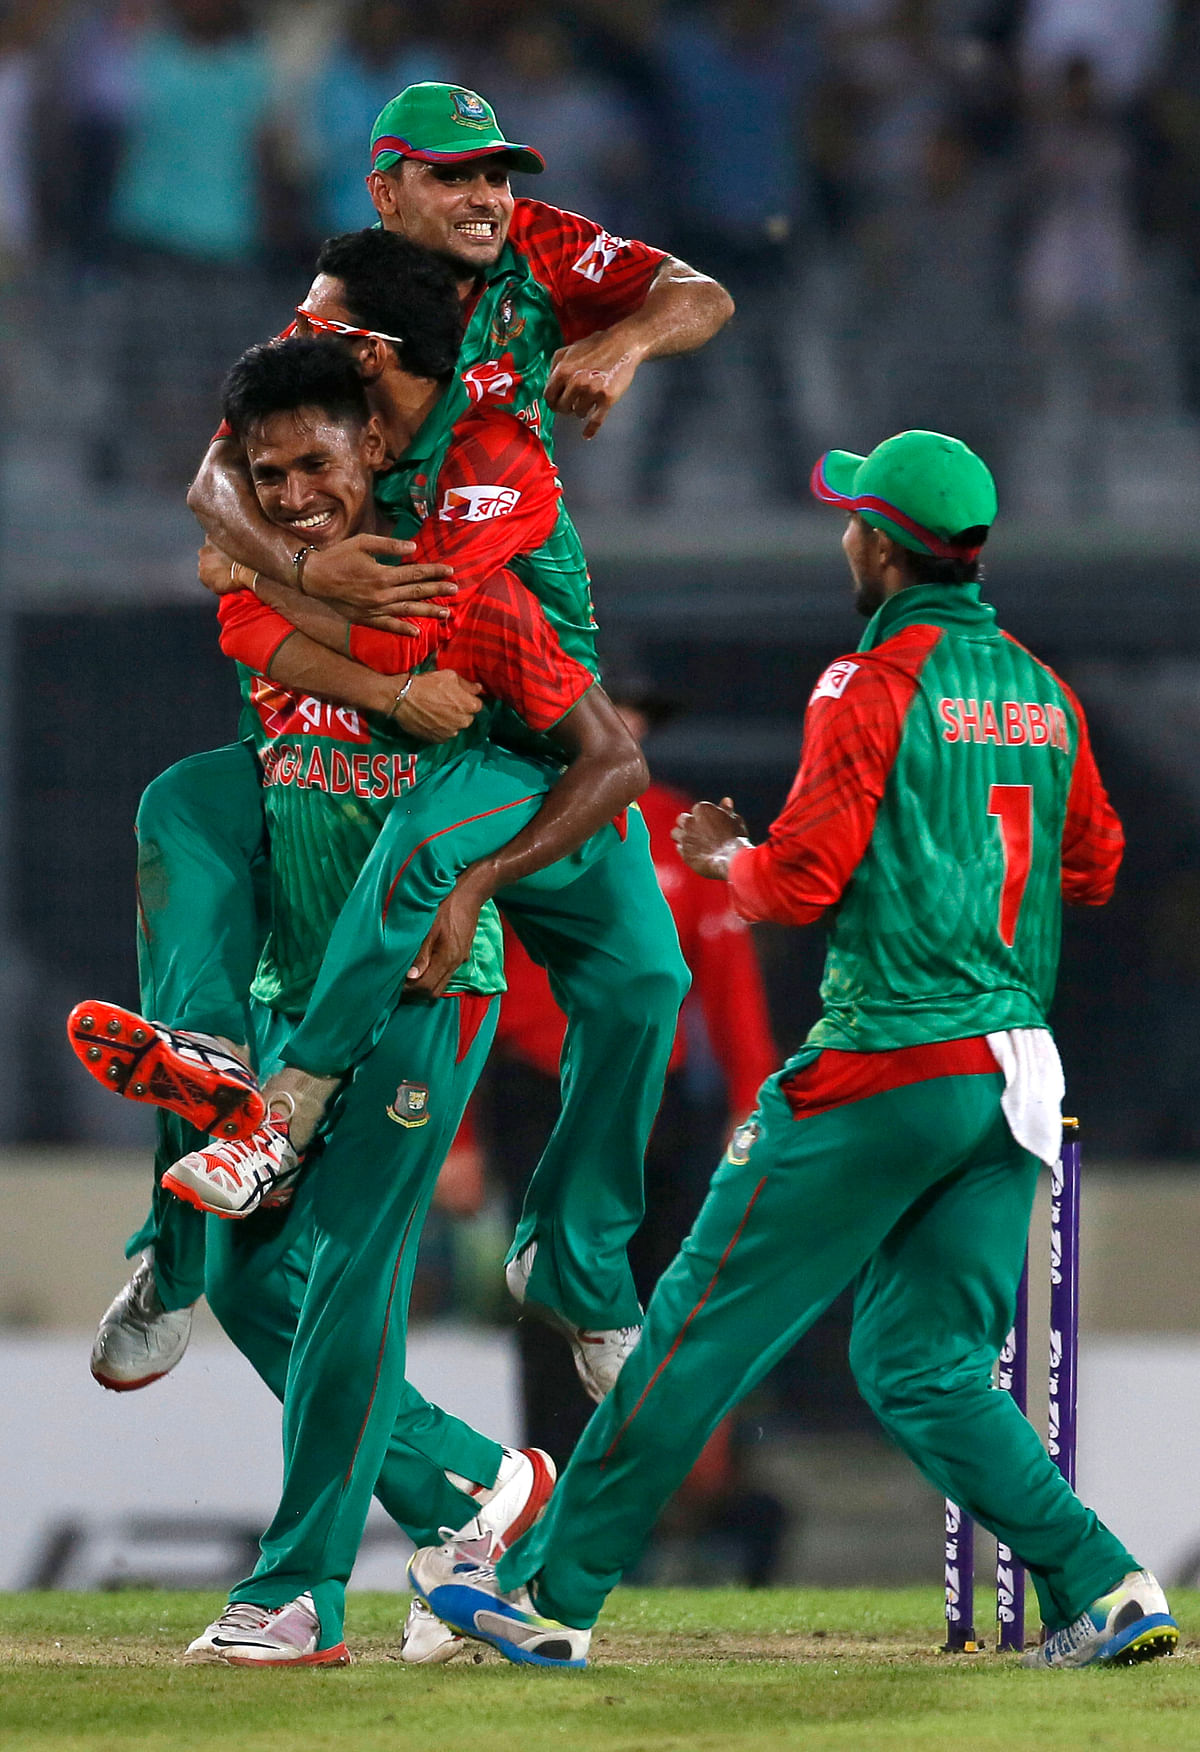 Bangladesh's Nasir Hossain, top, and captain Mashrafe Mortaza, center, jumps on Mustafizur Rahman as they celebrate the dismissal of Ravindra Jadeja. (Photo: AP)